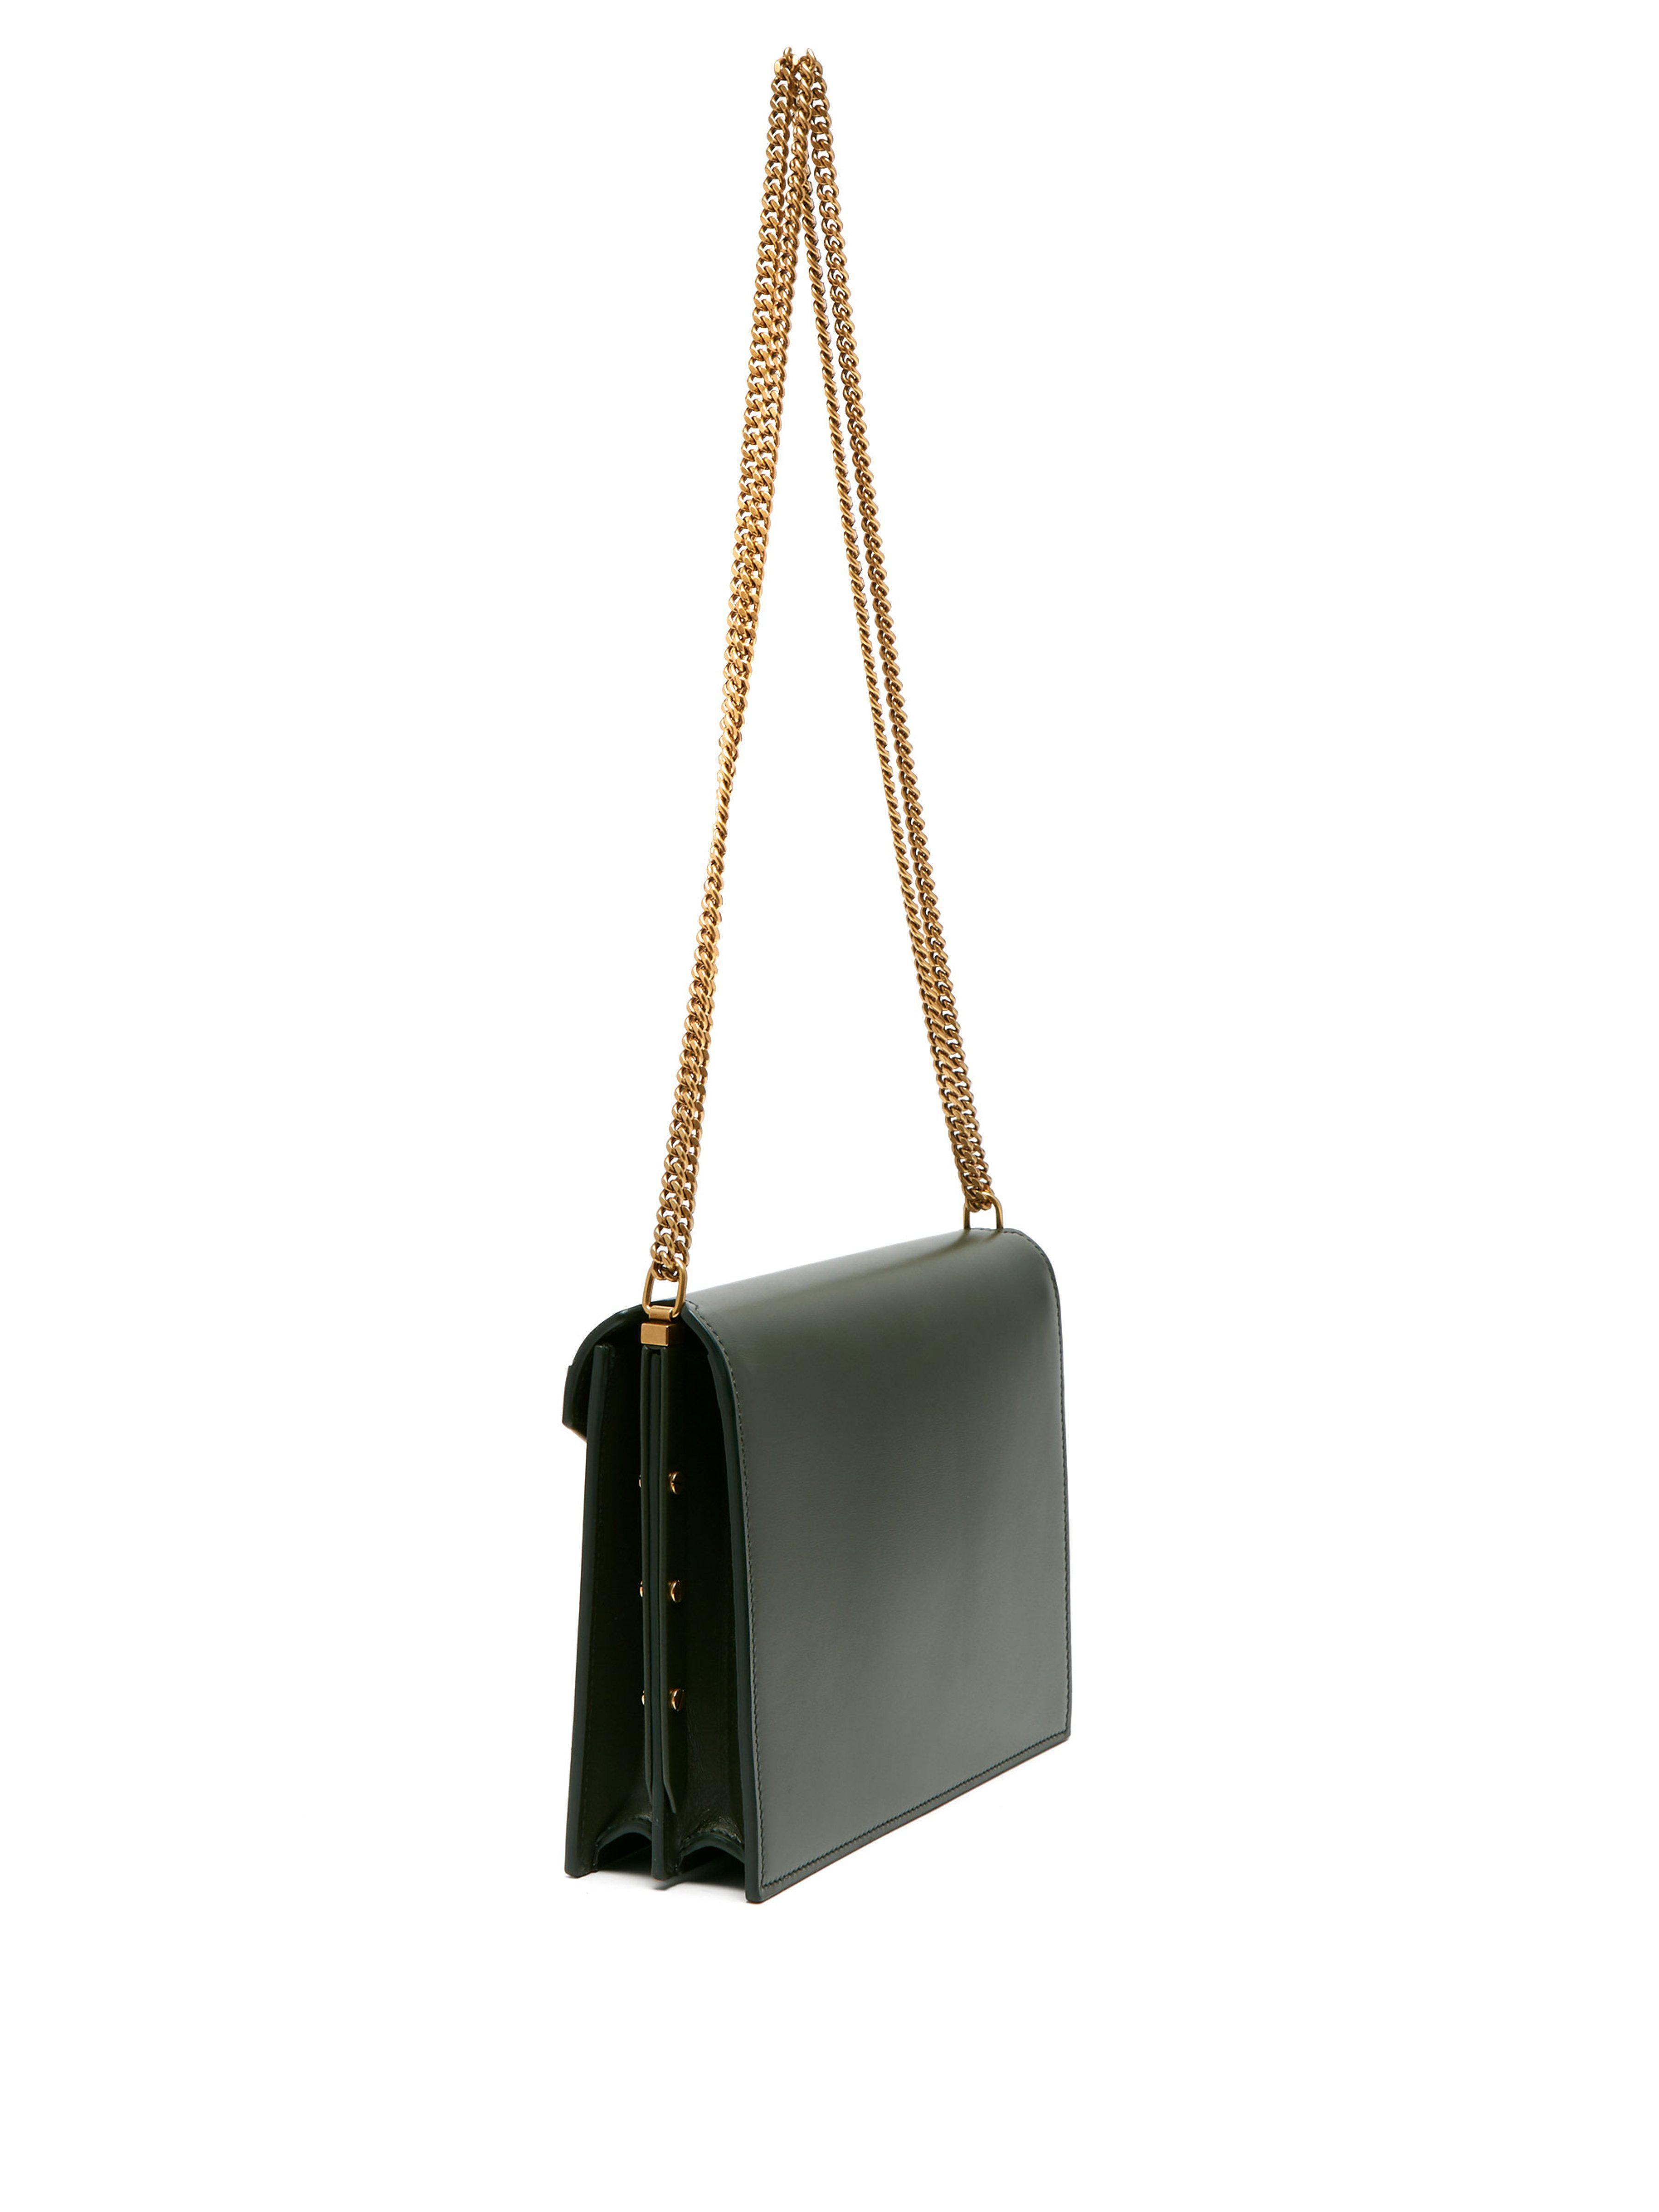 e9114248b0 Saint Laurent Cassandra Ysl-clasp Leather Cross-body Bag in Green - Lyst